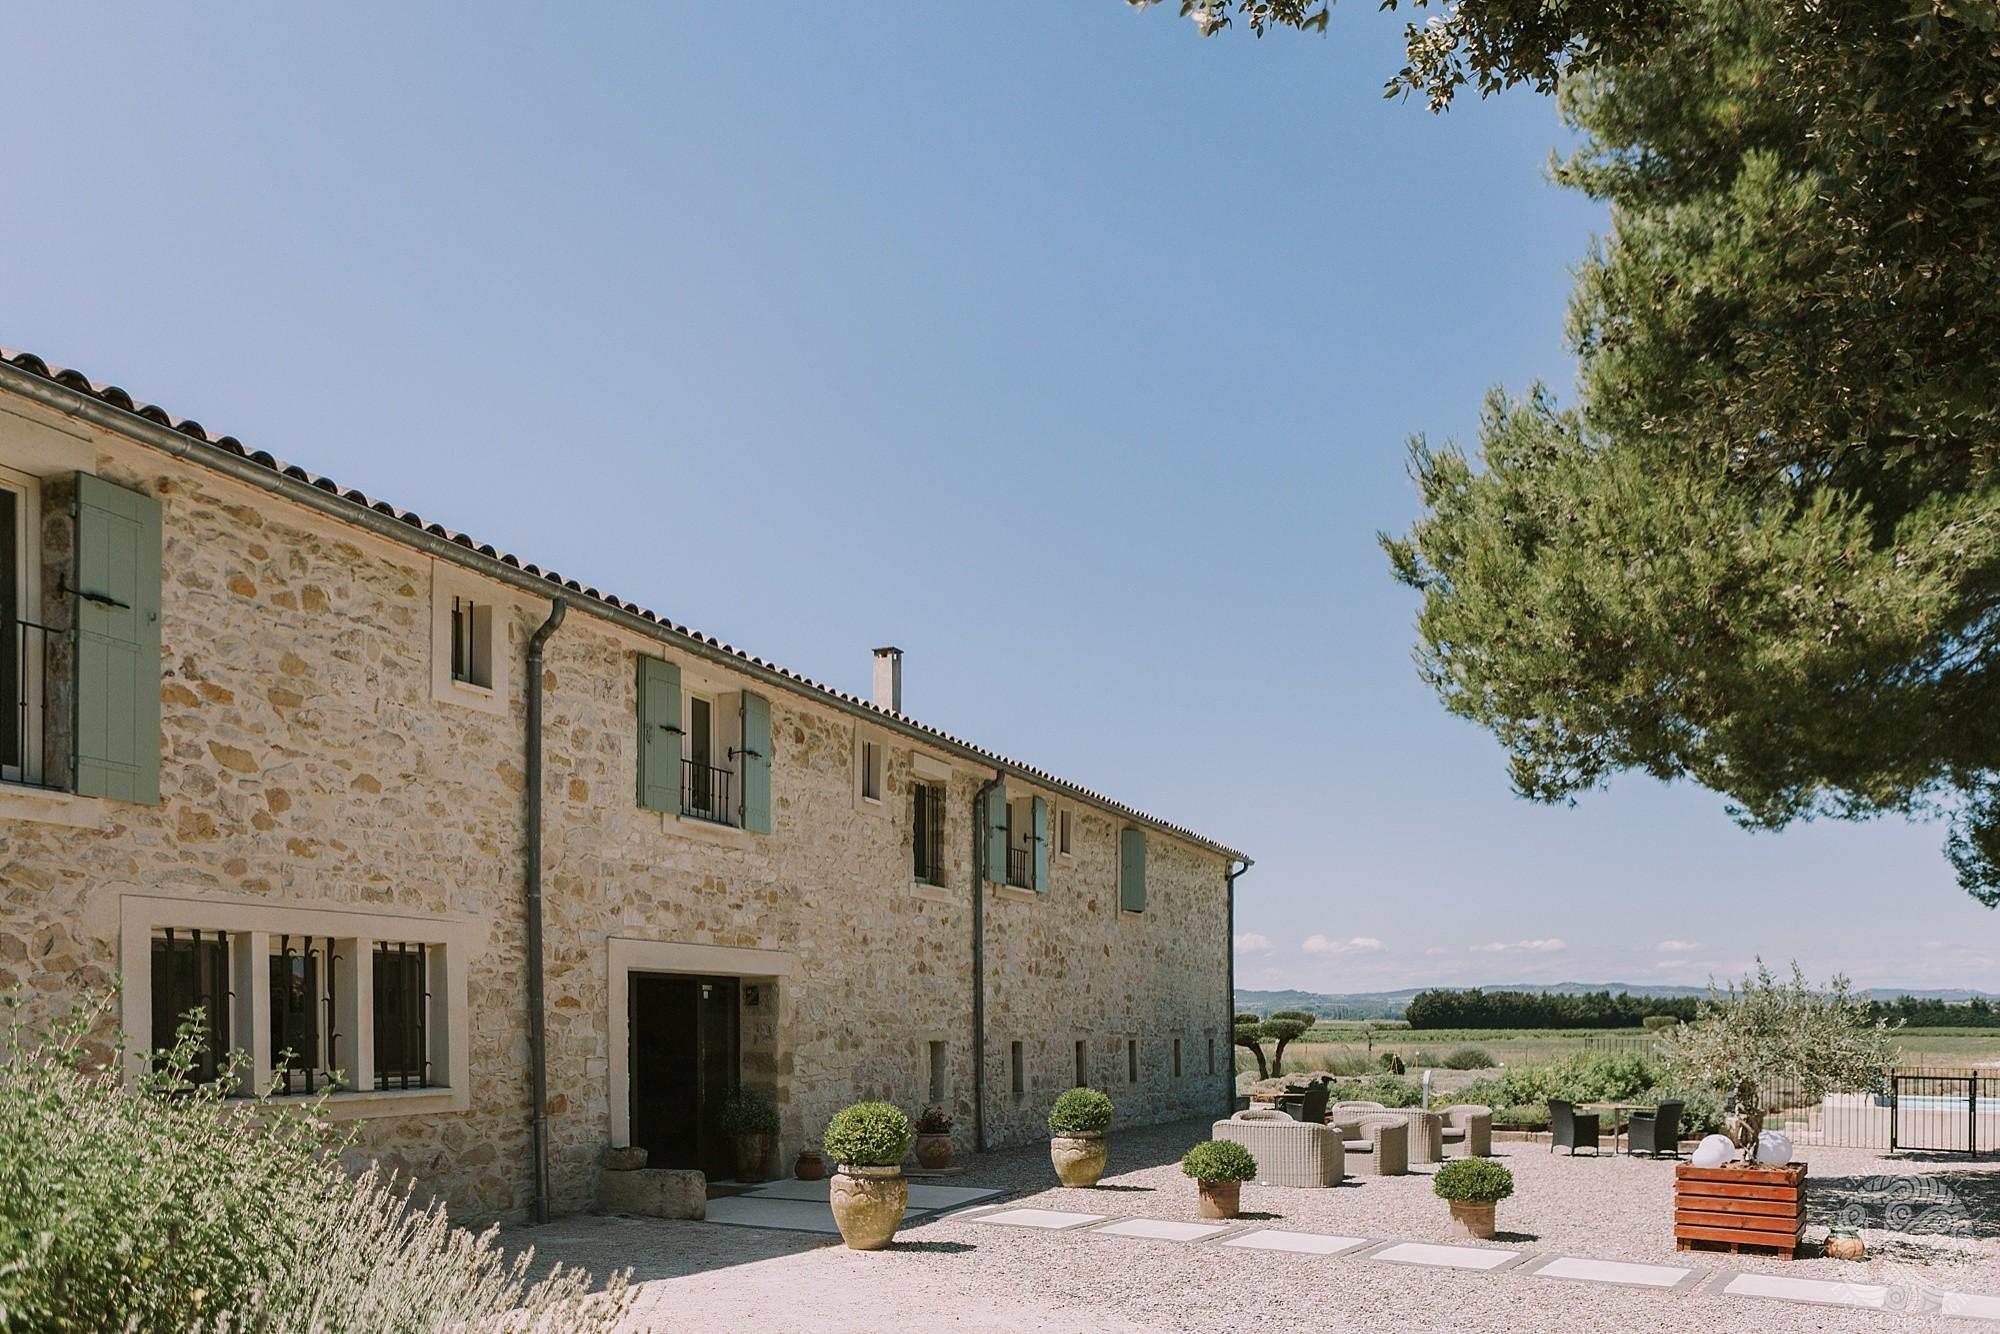 Kateryna-photos-photographe-mariage-vaucluse-provence-avignon-ferme-st-hugues_0001.jpg